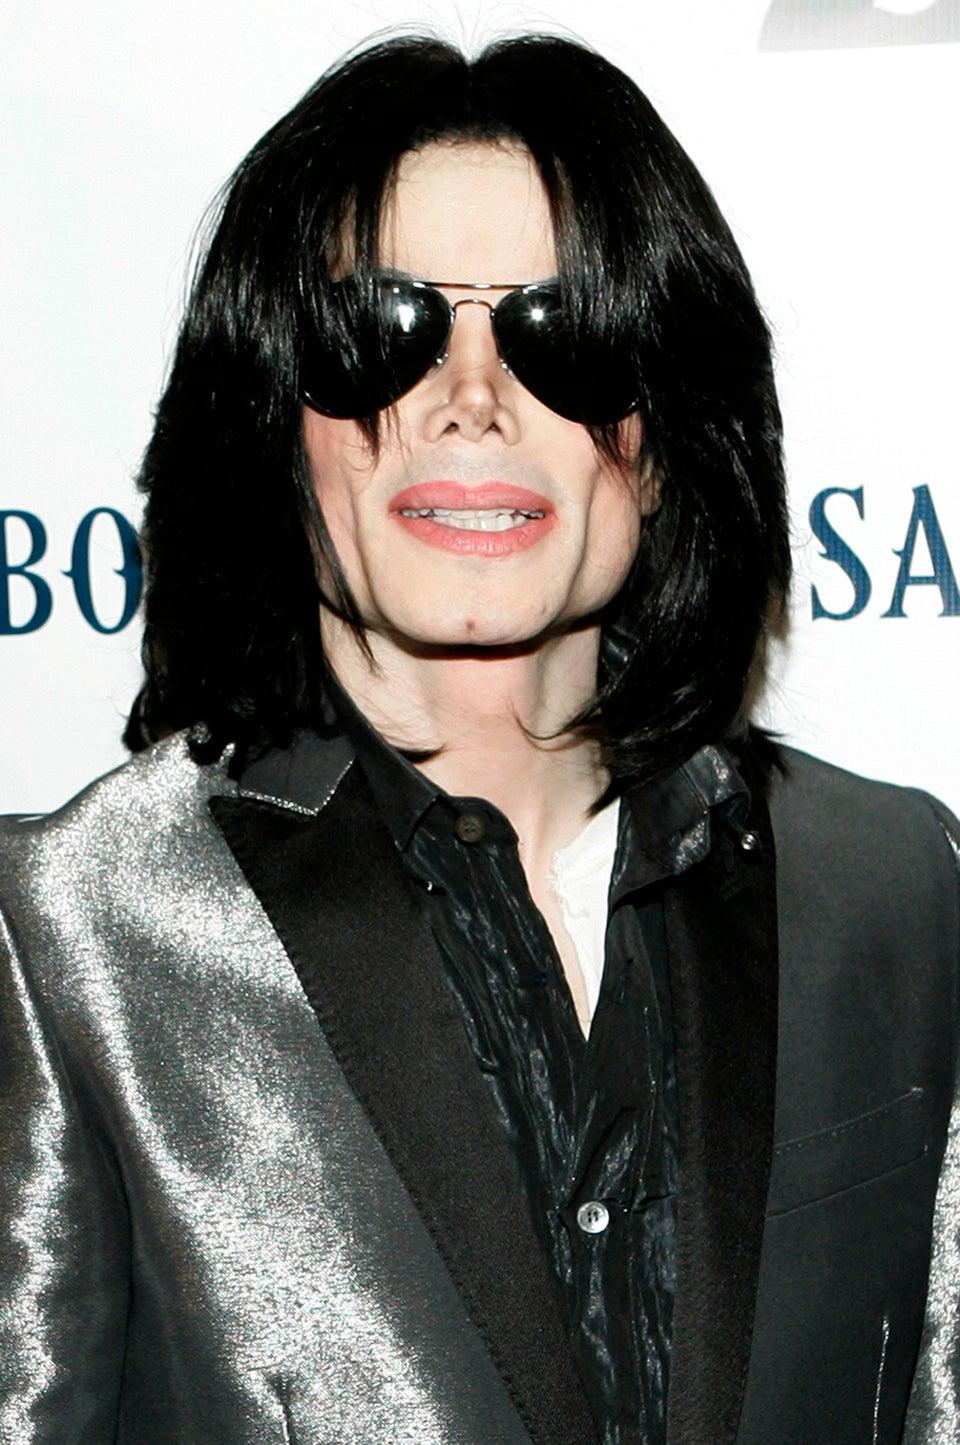 Michael Jackson is Your Next Superhero